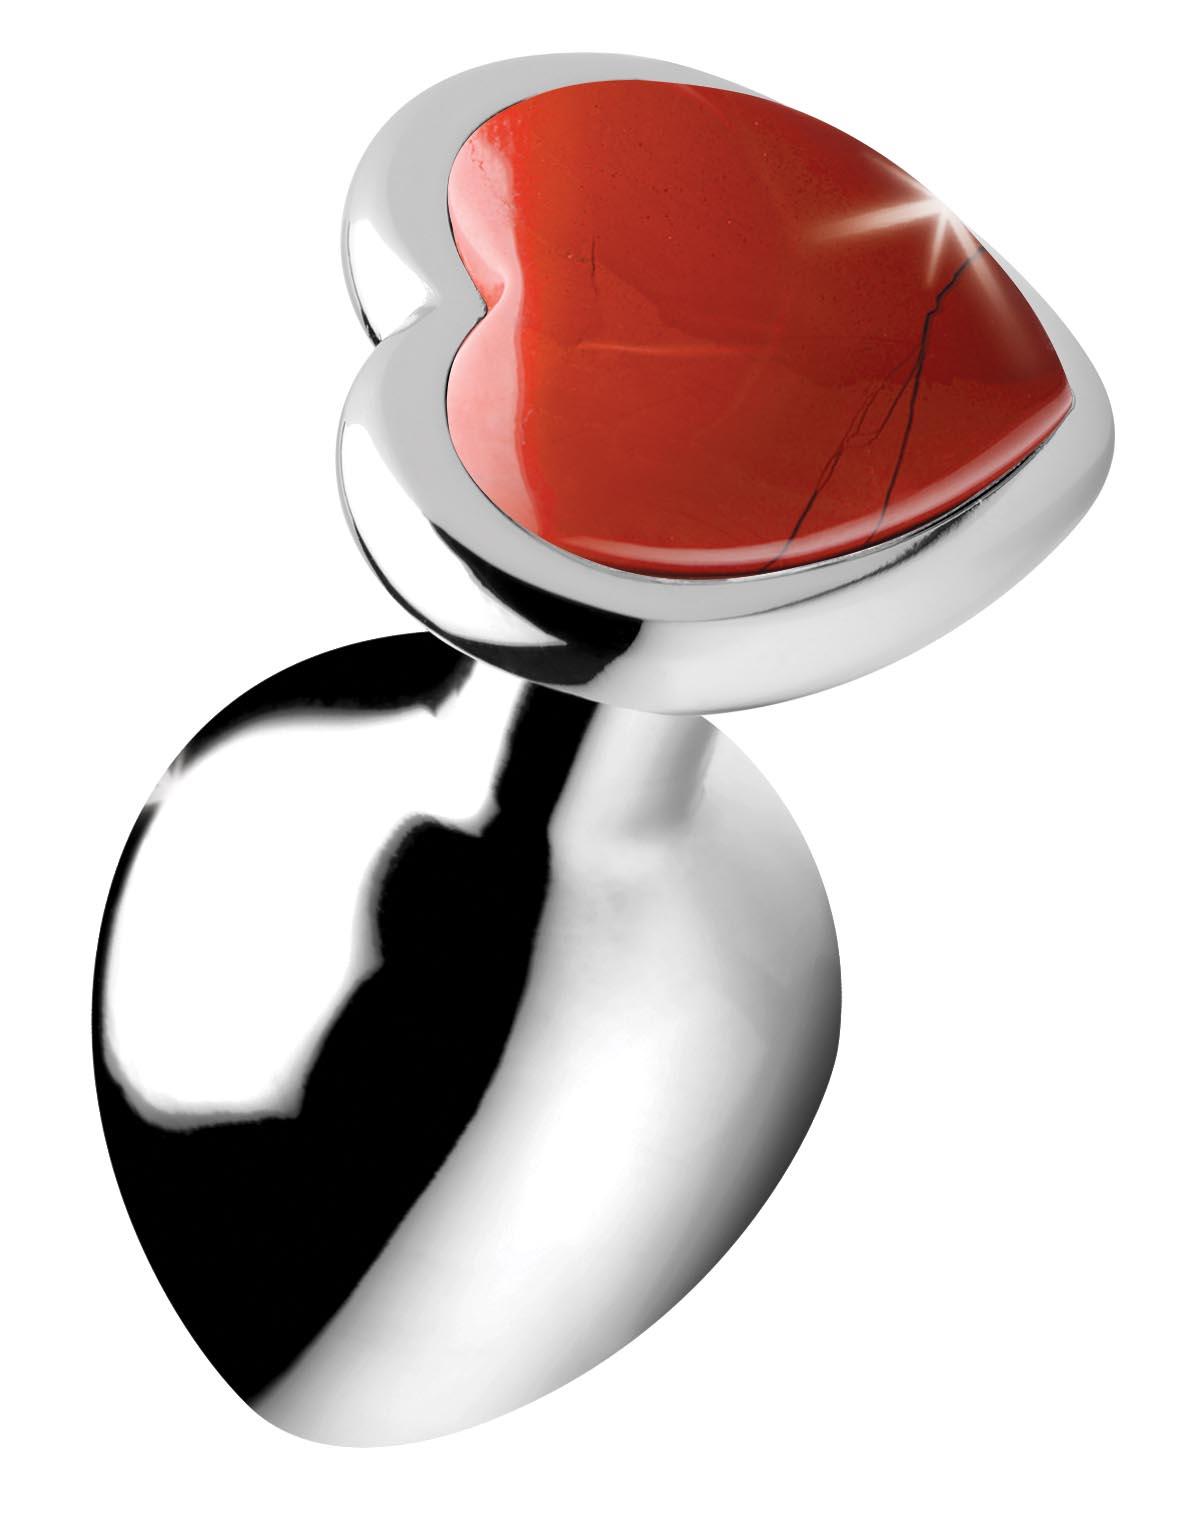 Authentic Red Jasper Gemstone Heart Anal Plug – Medium